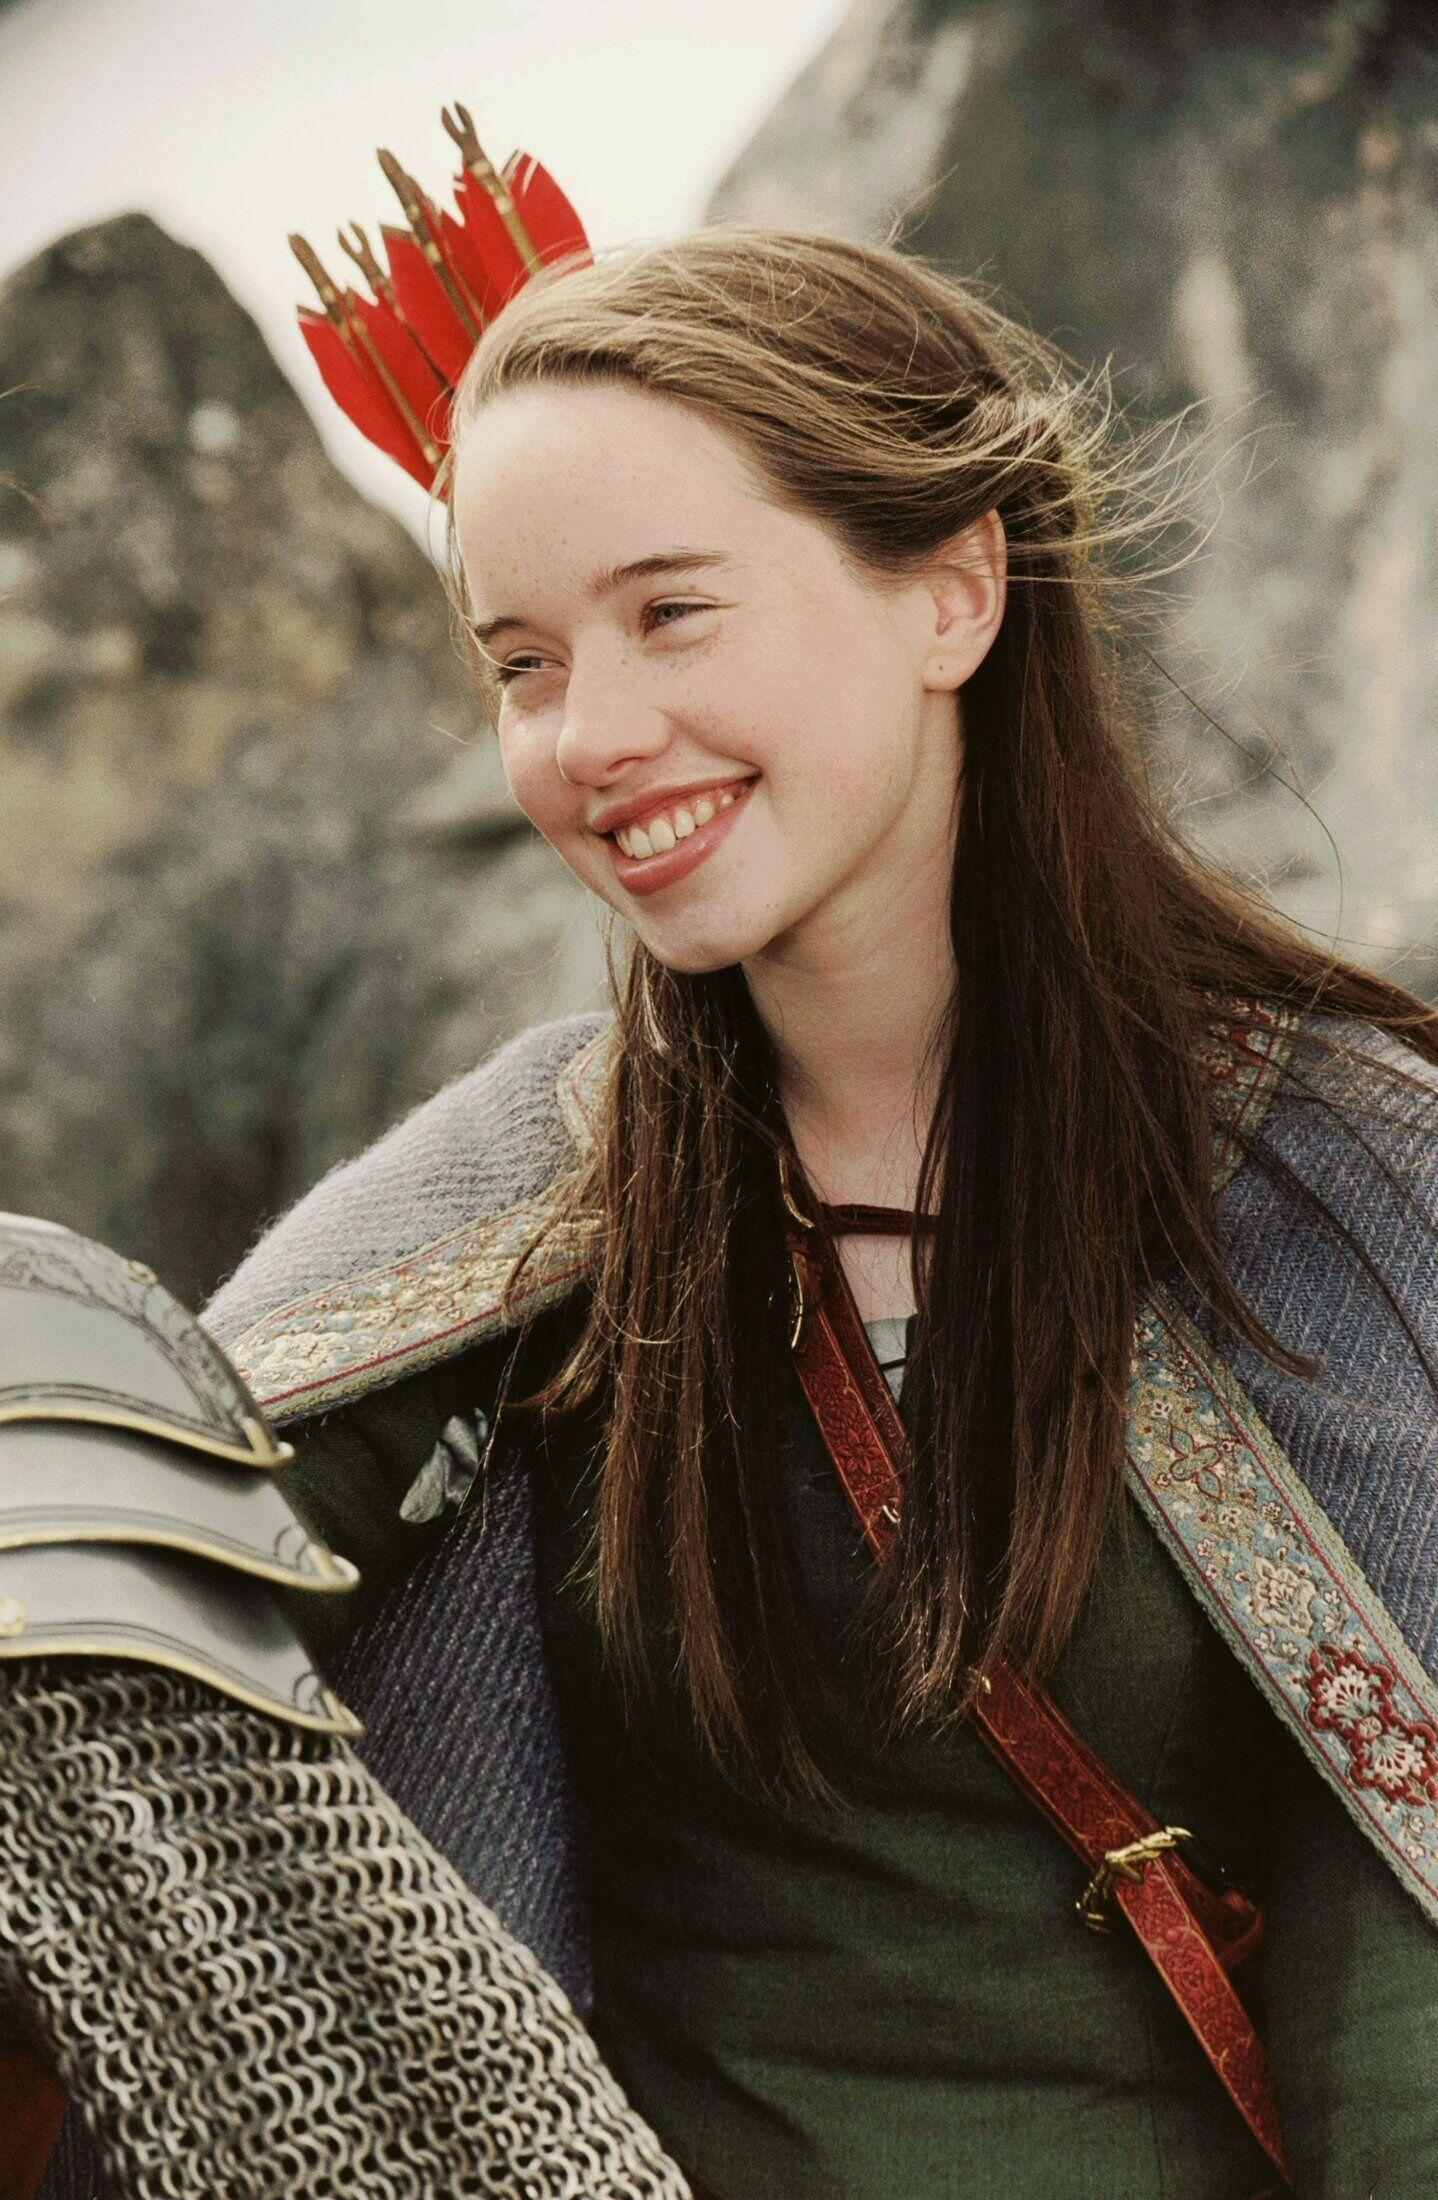 Lama Berlalu, Ini Kabar Susan Pevensie 'The Chronicles of Narnia' Kini